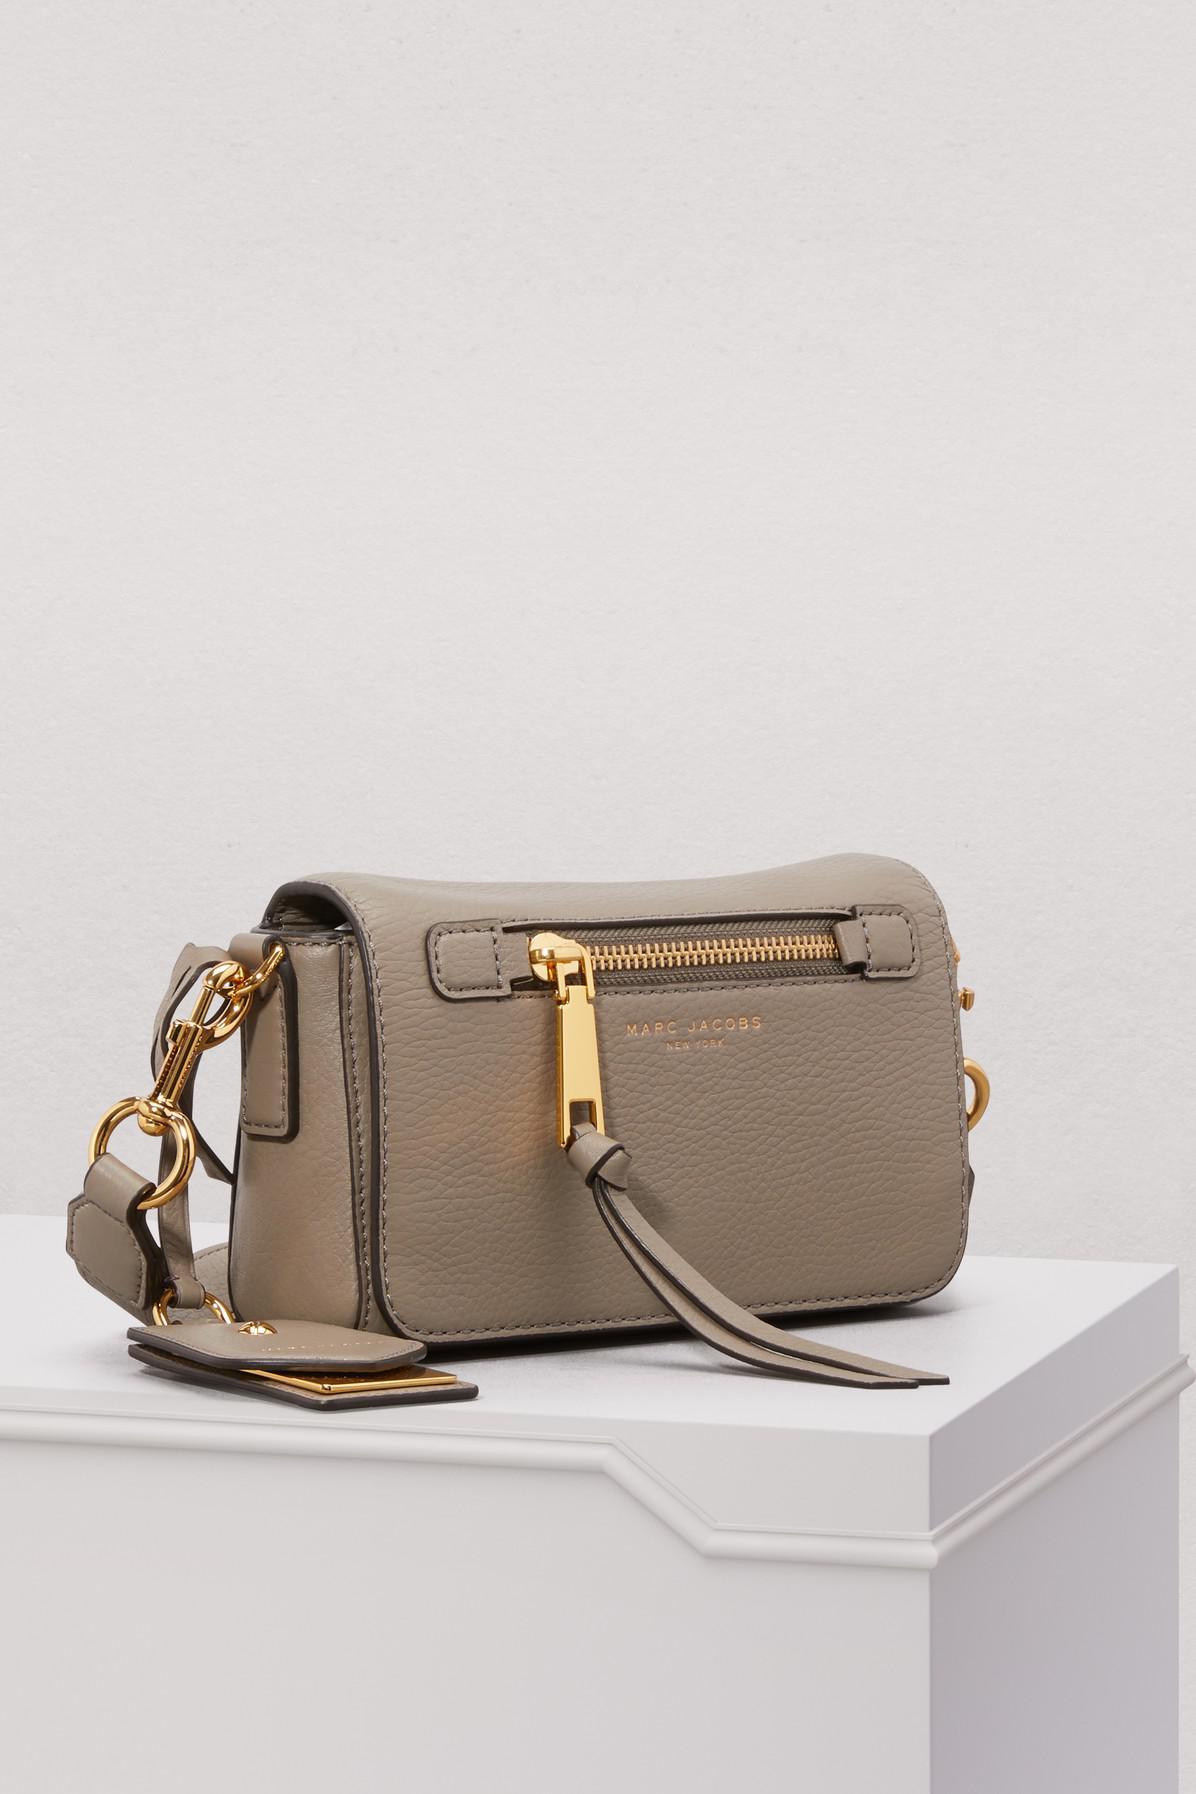 Marc Jacobs Recruit Crossbody Bag